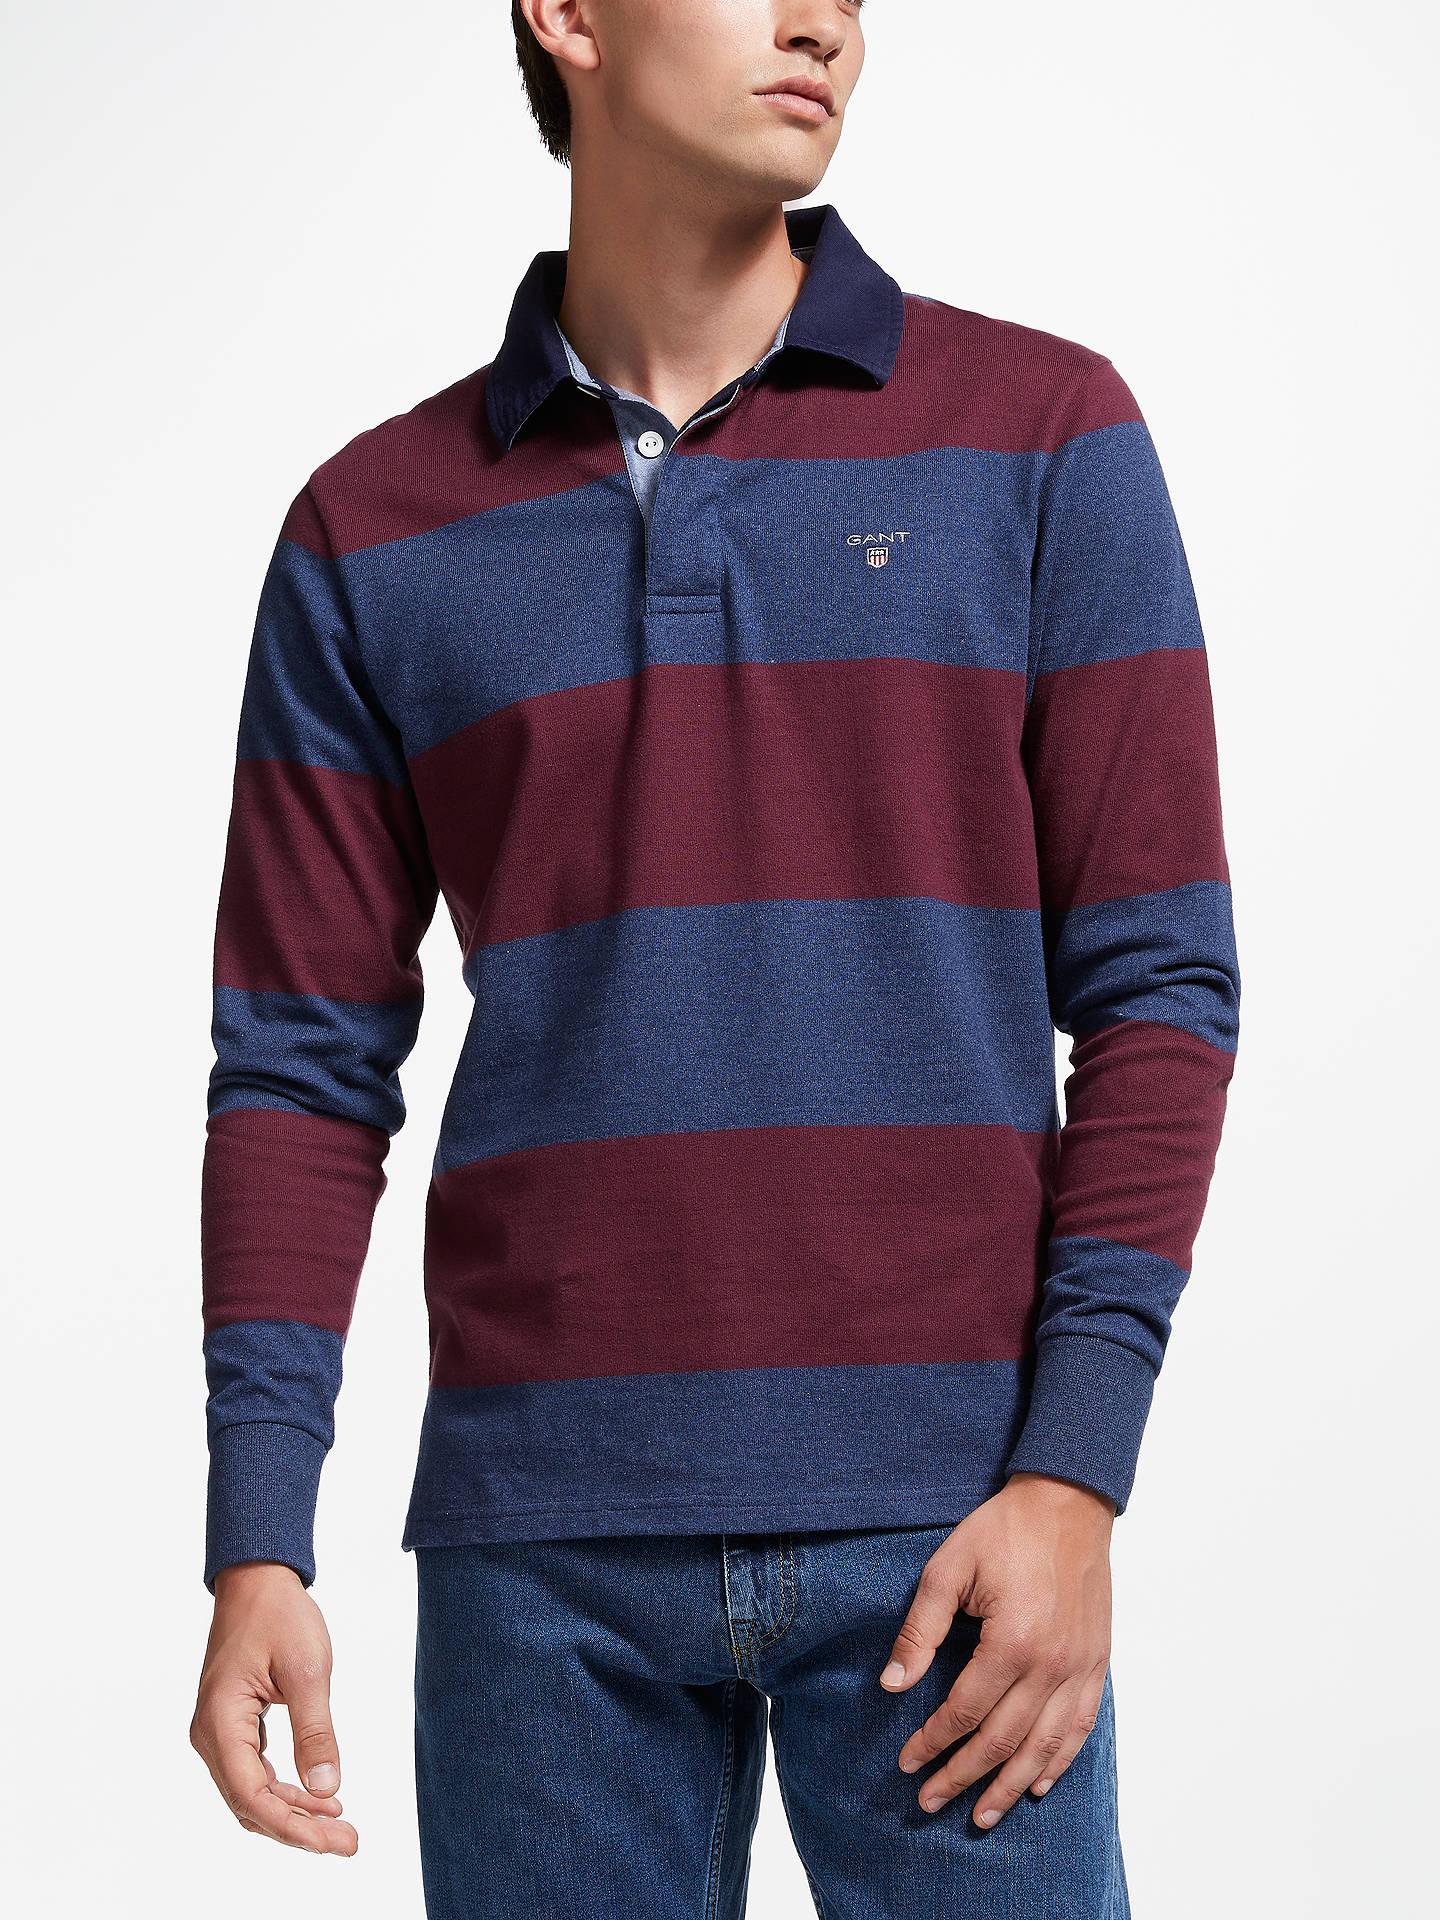 216b1f0141 Buy GANT Rugger Long Sleeve Stripe Rugby Shirt, Red, M Online at johnlewis.